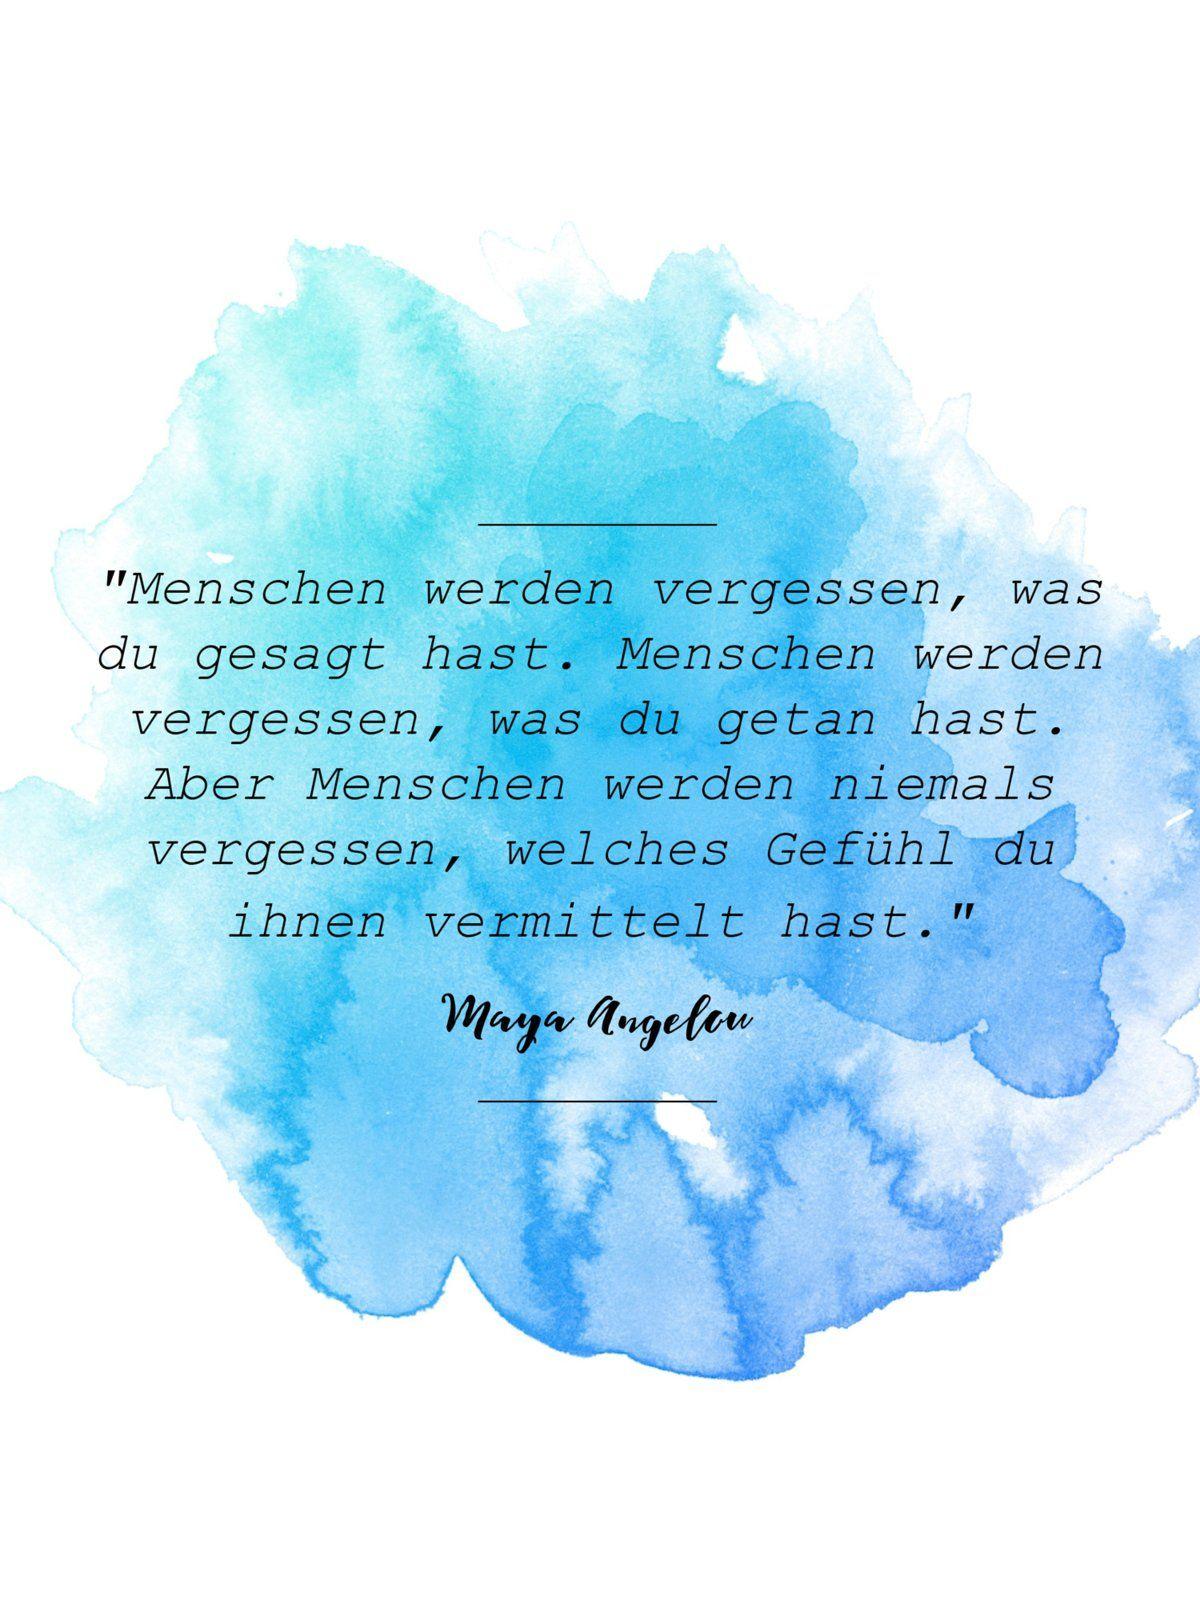 Menschen Werden Vergessen Was Du Gesagt Hast Menschen Werden Vergessen Was Du Getan Hast Aber Menschen Werde Maya Angelou Zitate Zitate Beruhmter Personen